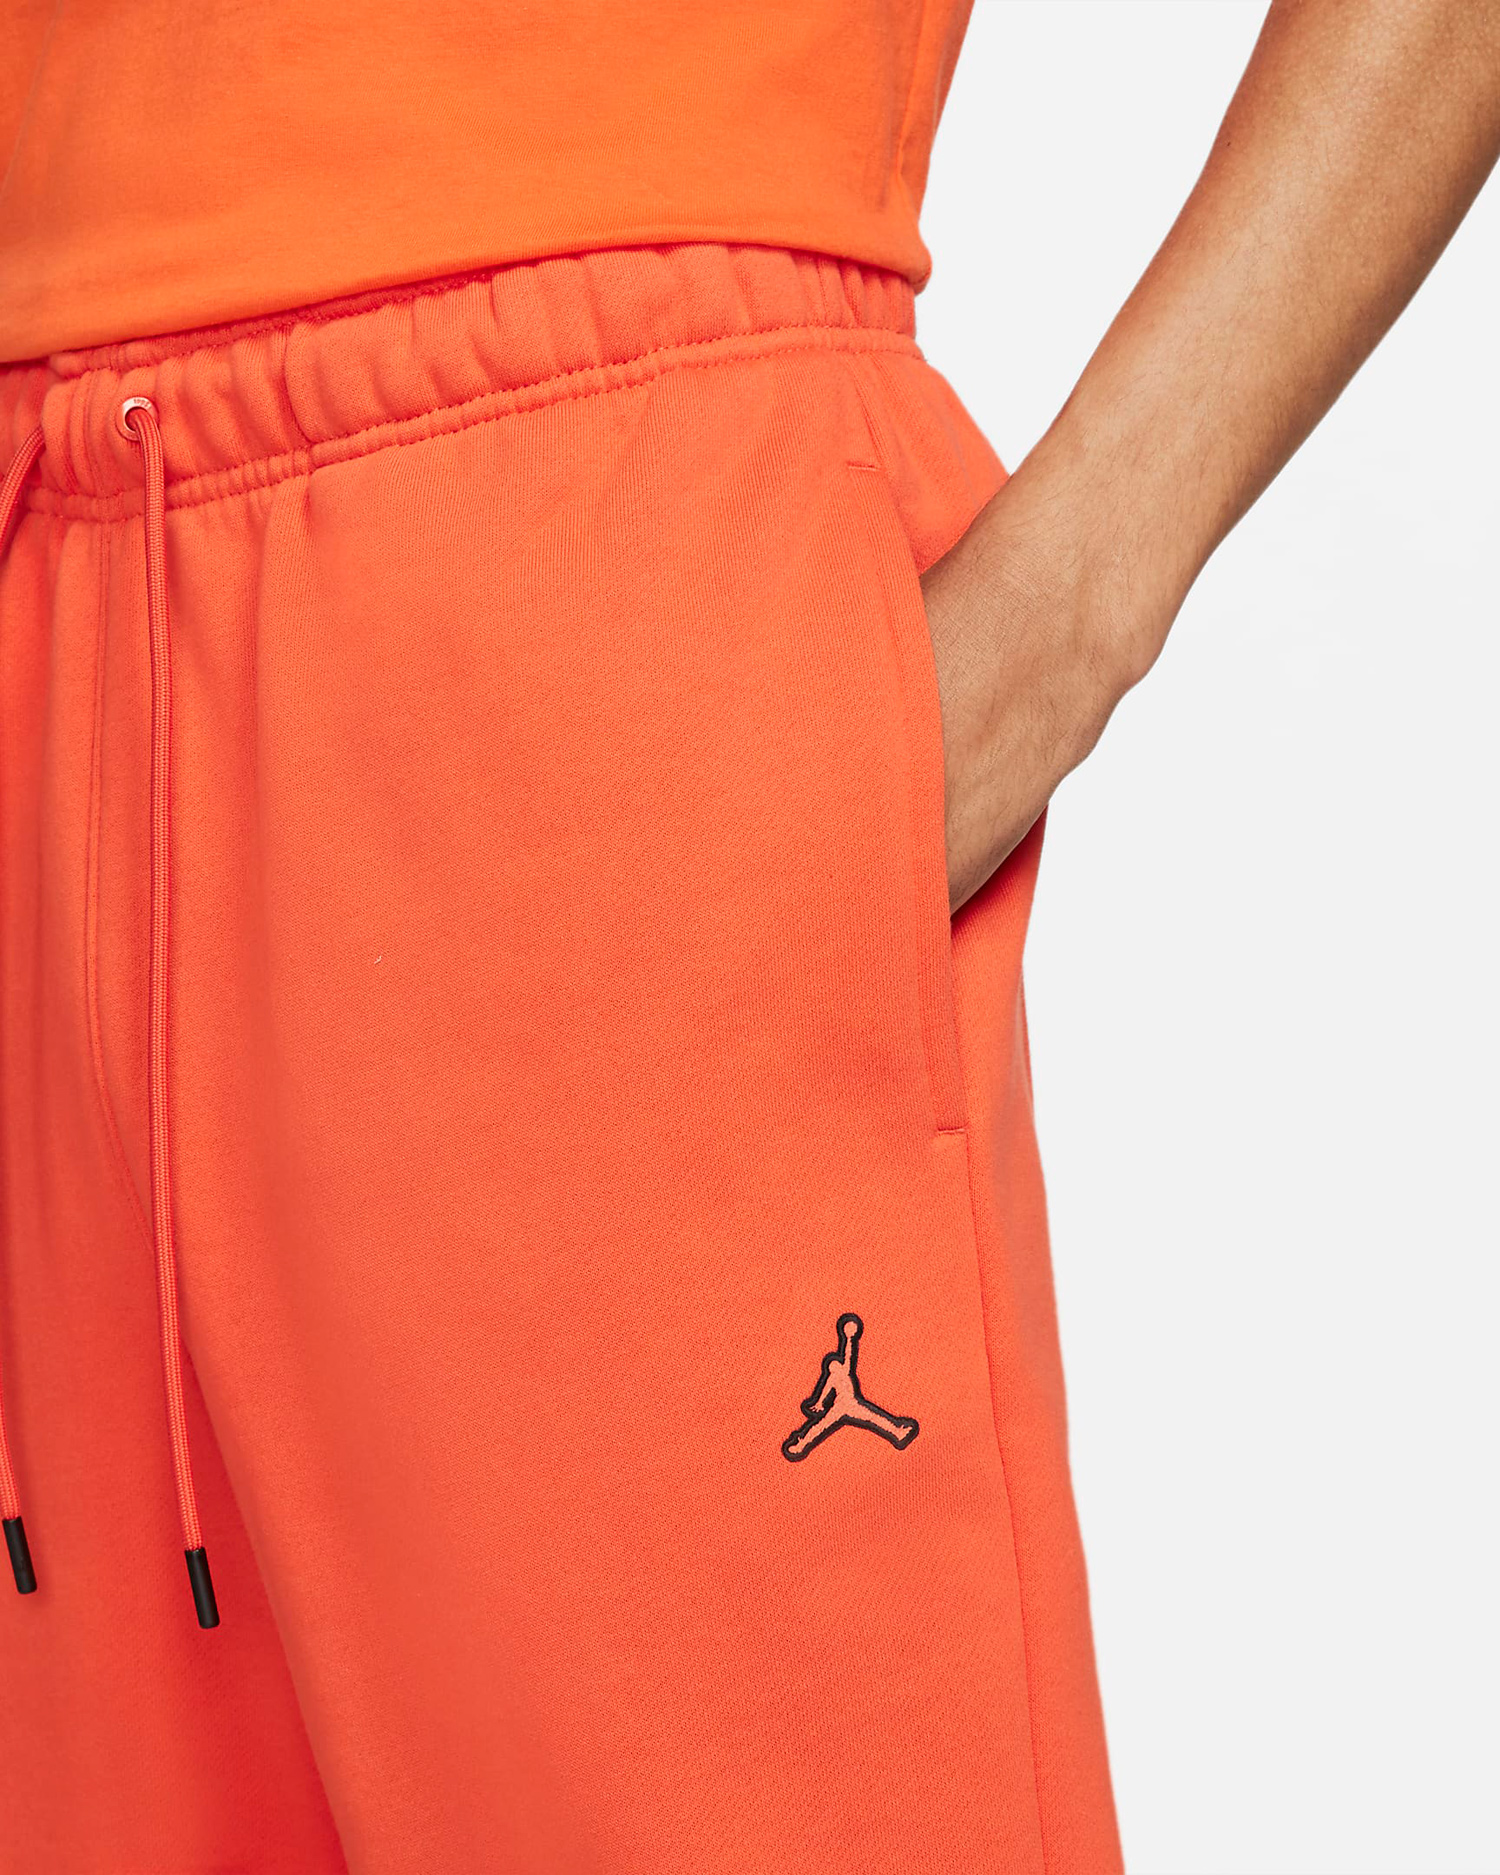 jordan-electro-orange-fleece-pants-2